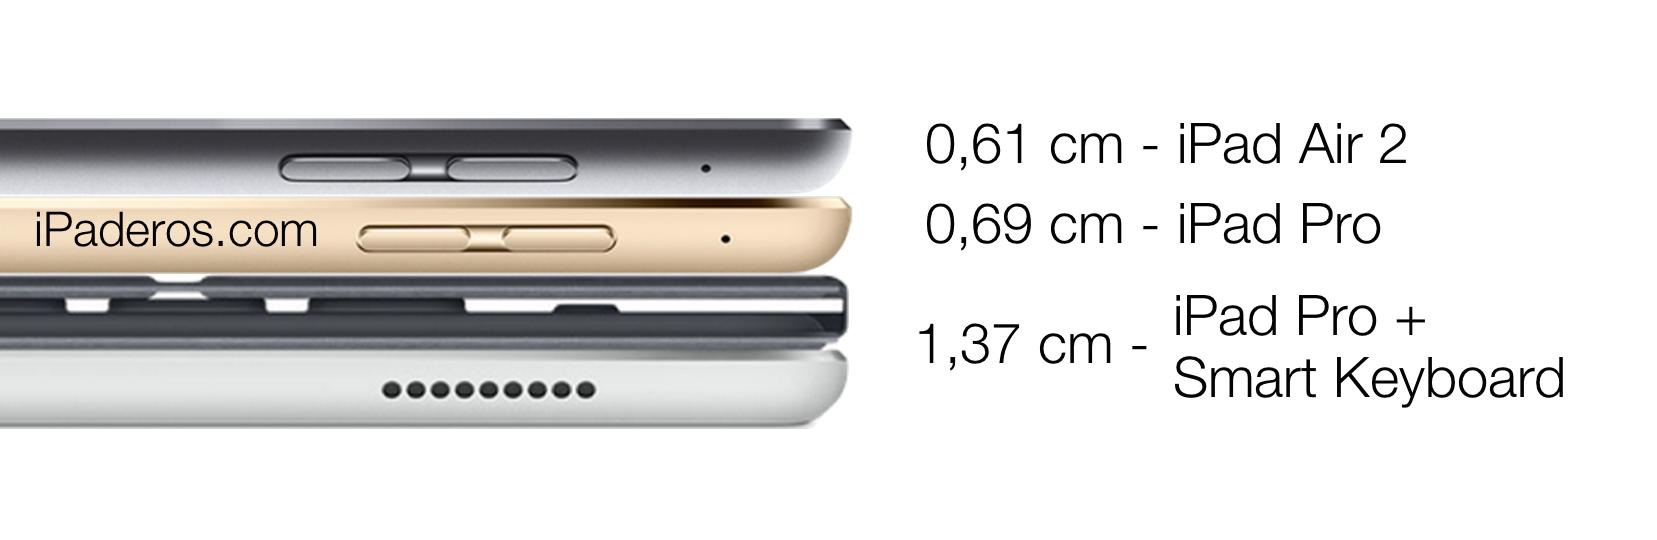 iPad Pro vs iPad Air 2 size comparison